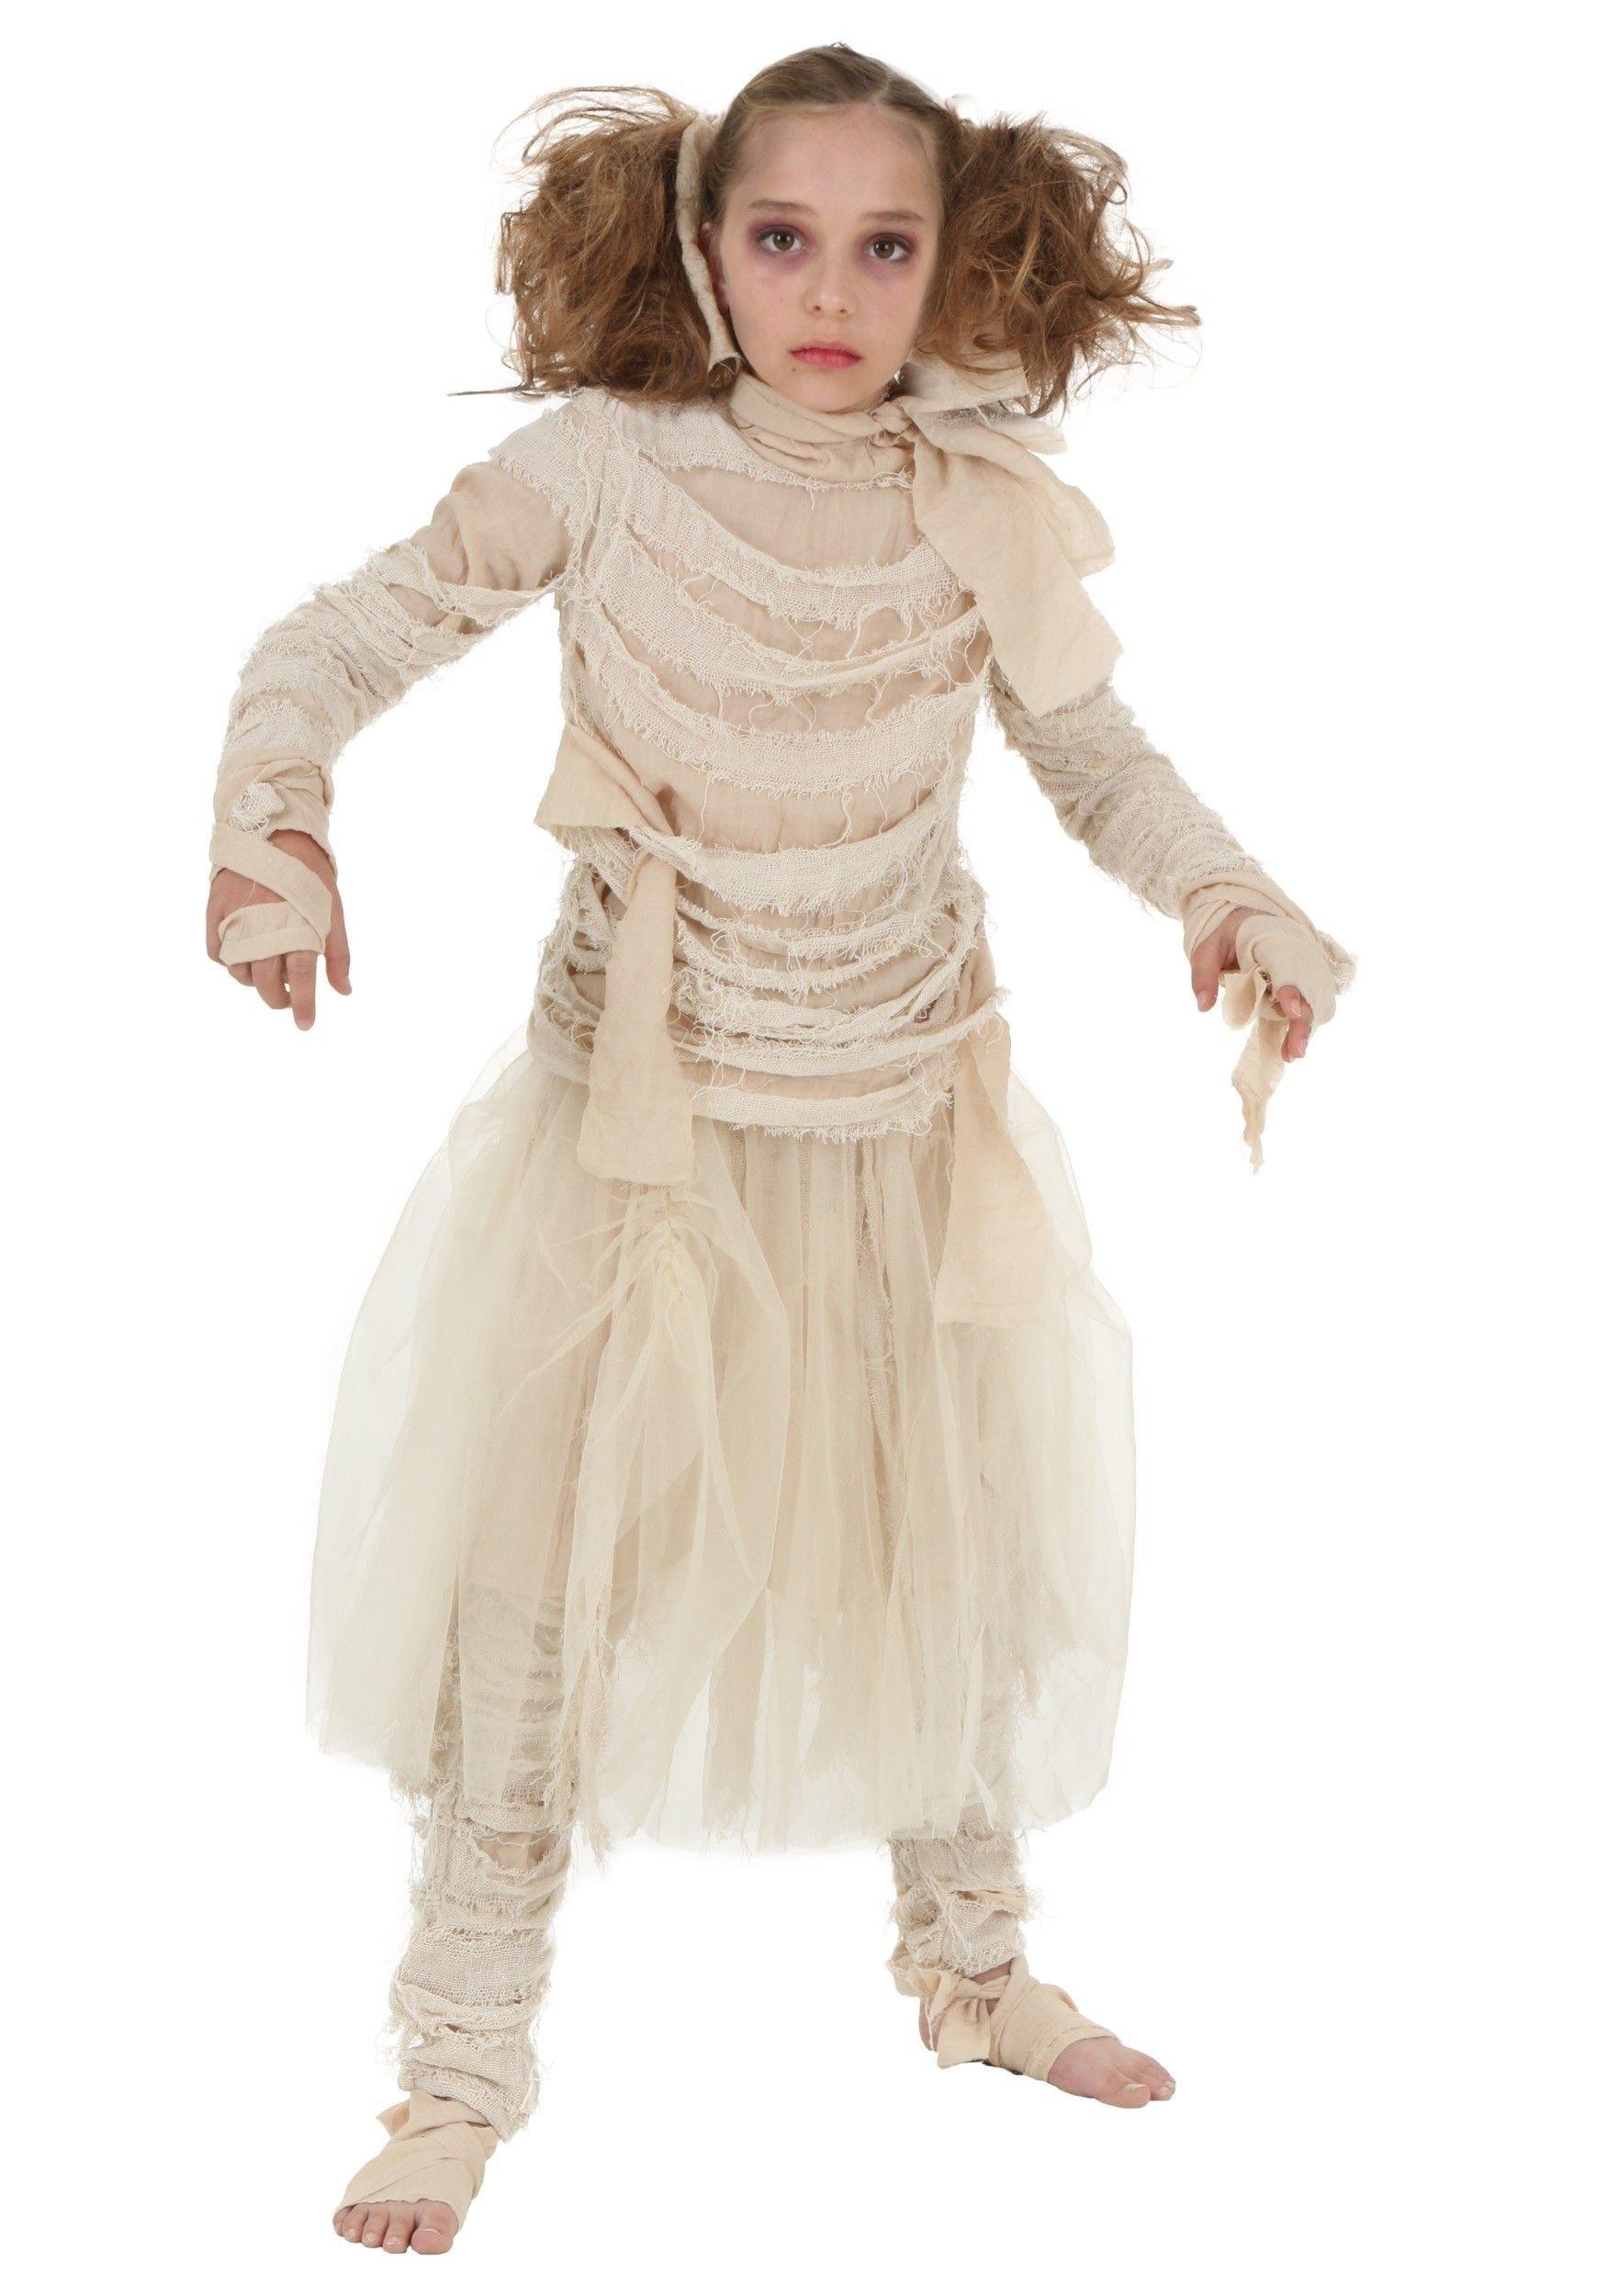 10 Fashionable Scary Costume Ideas For Girls girls mummy costume sierra pinterest costumes halloween ideas